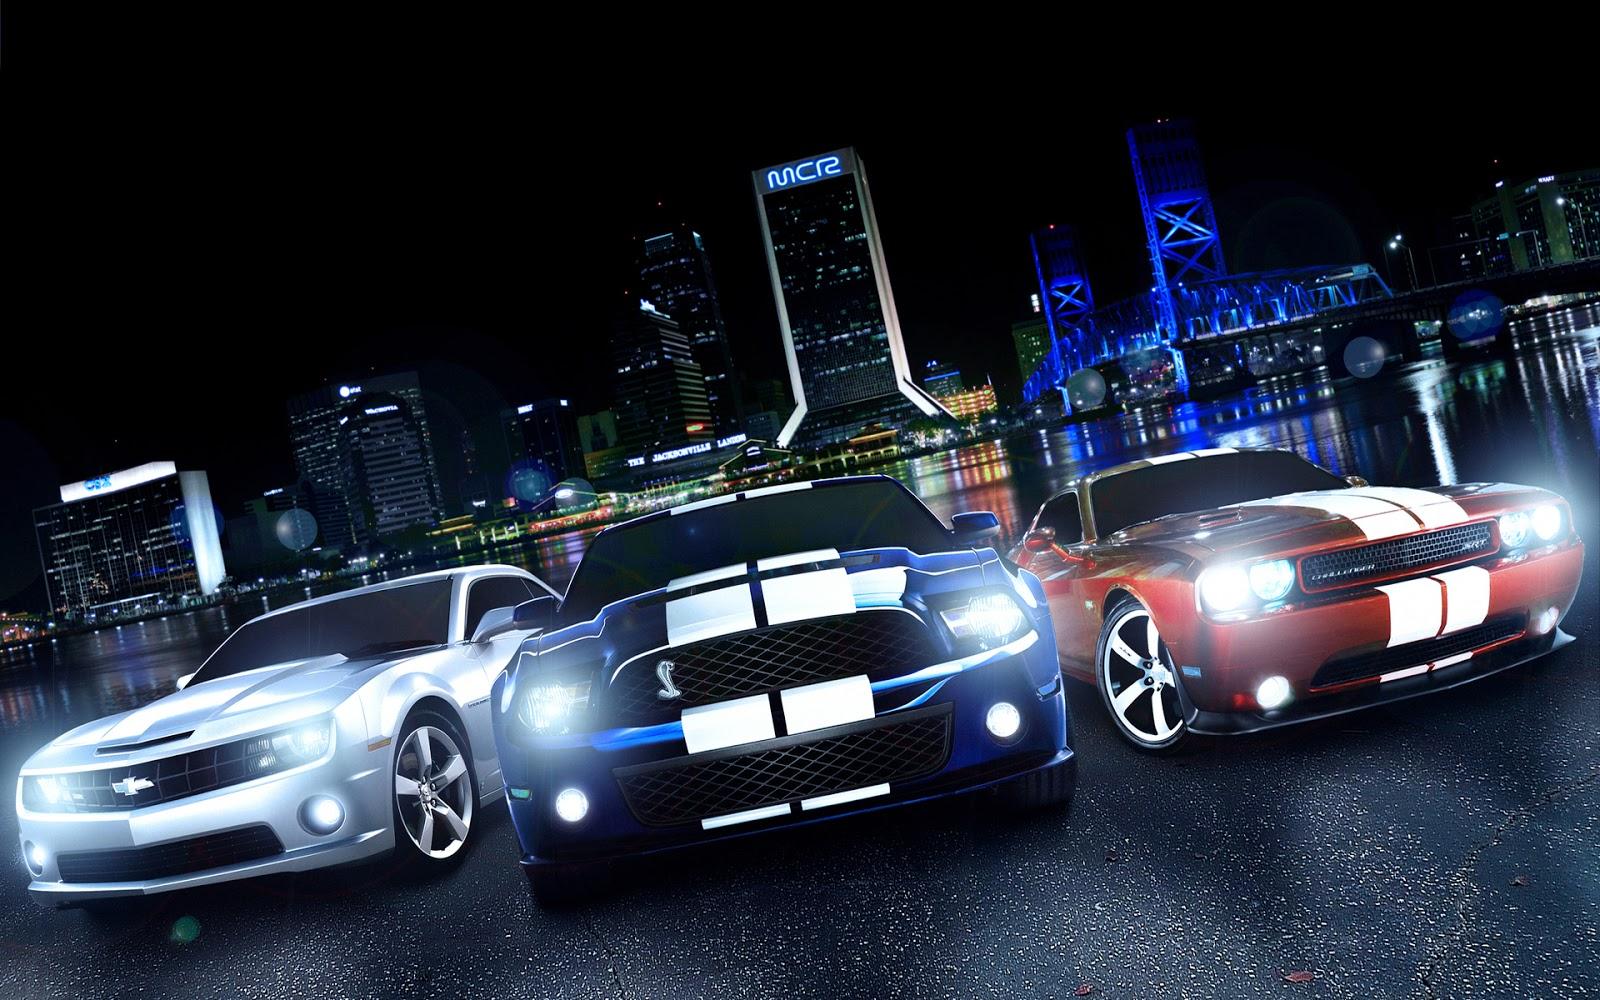 Muscle Car Wallpapers For Desktop: Desktop Wallpapers 1080p: Ford Mustang